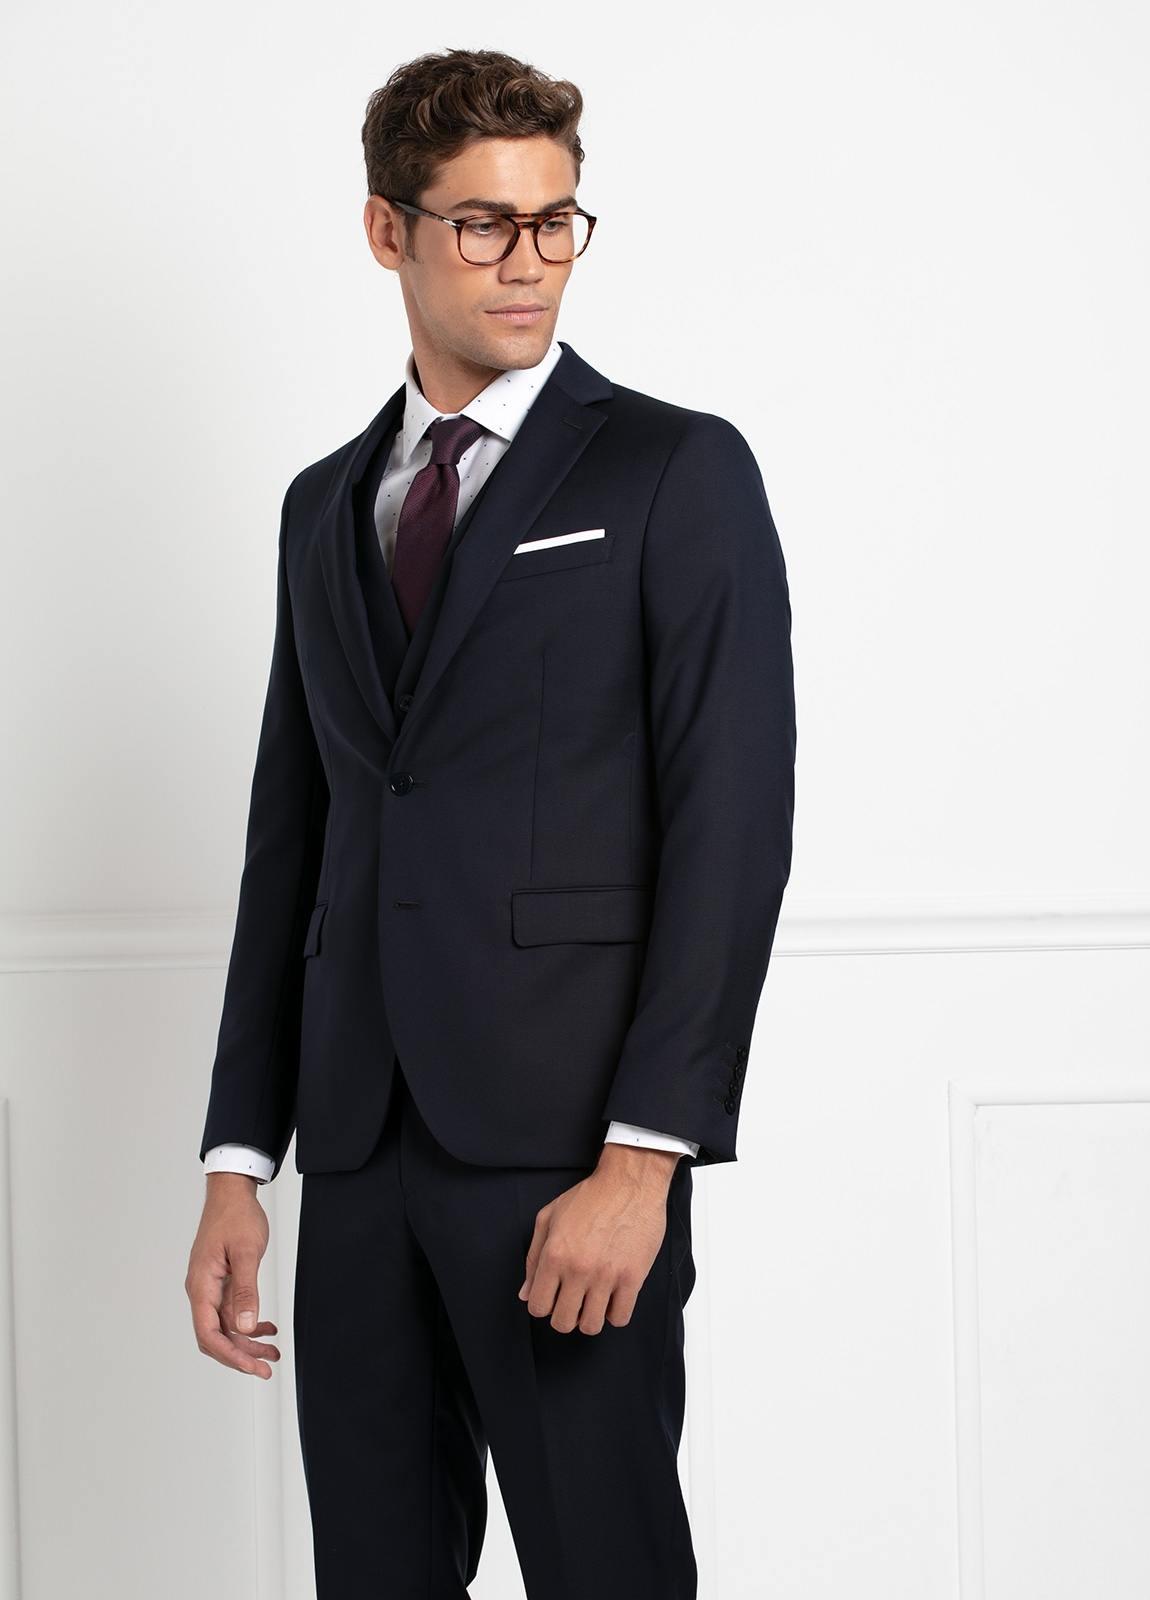 Traje liso SLIM FIT, tejido VBC con chaleco incluido, color azul marino, 100% Lana. - Ítem4